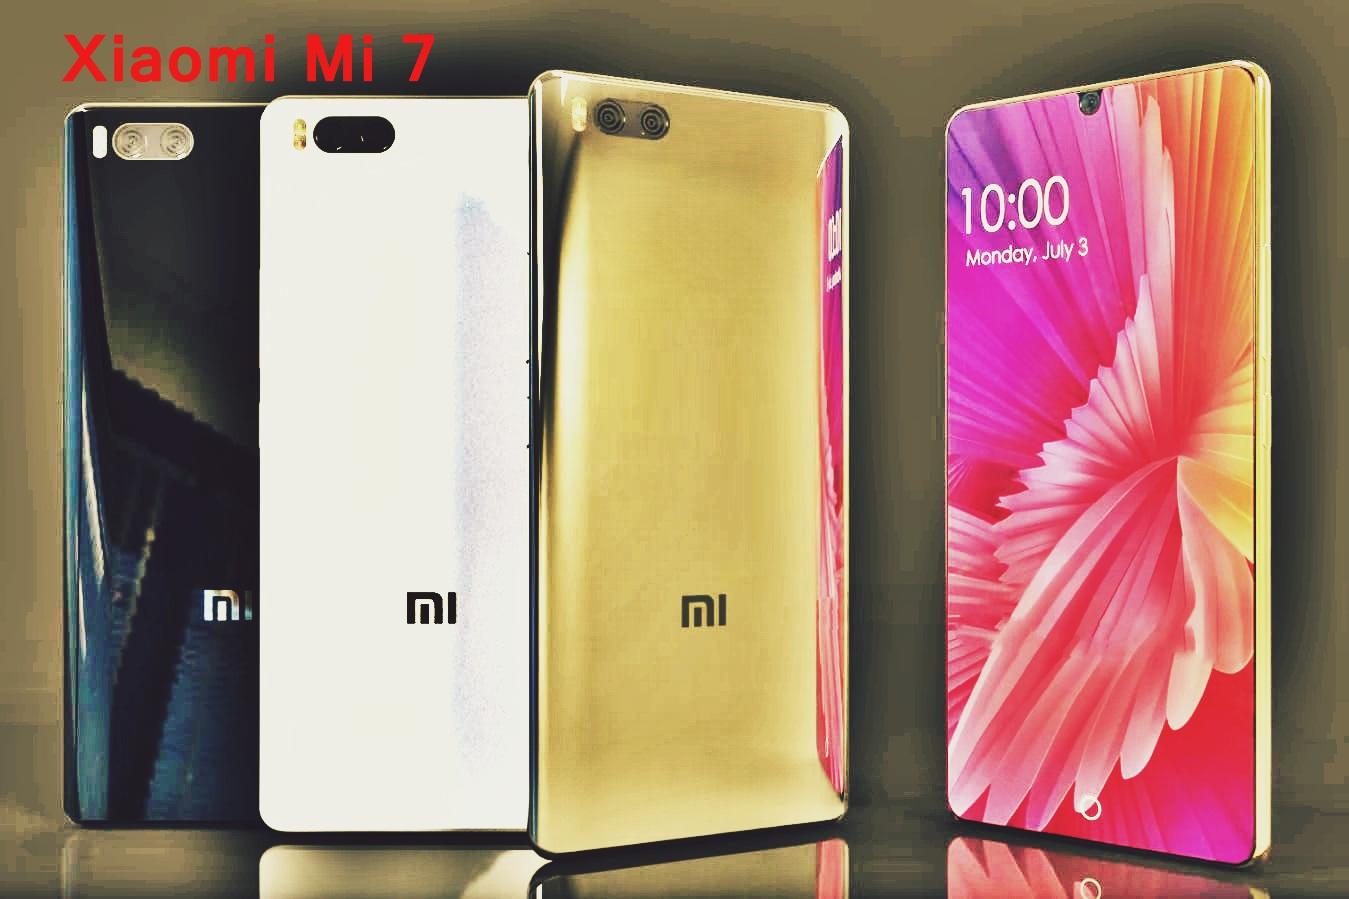 Xiaomi Mi 7: Rumors Roundup